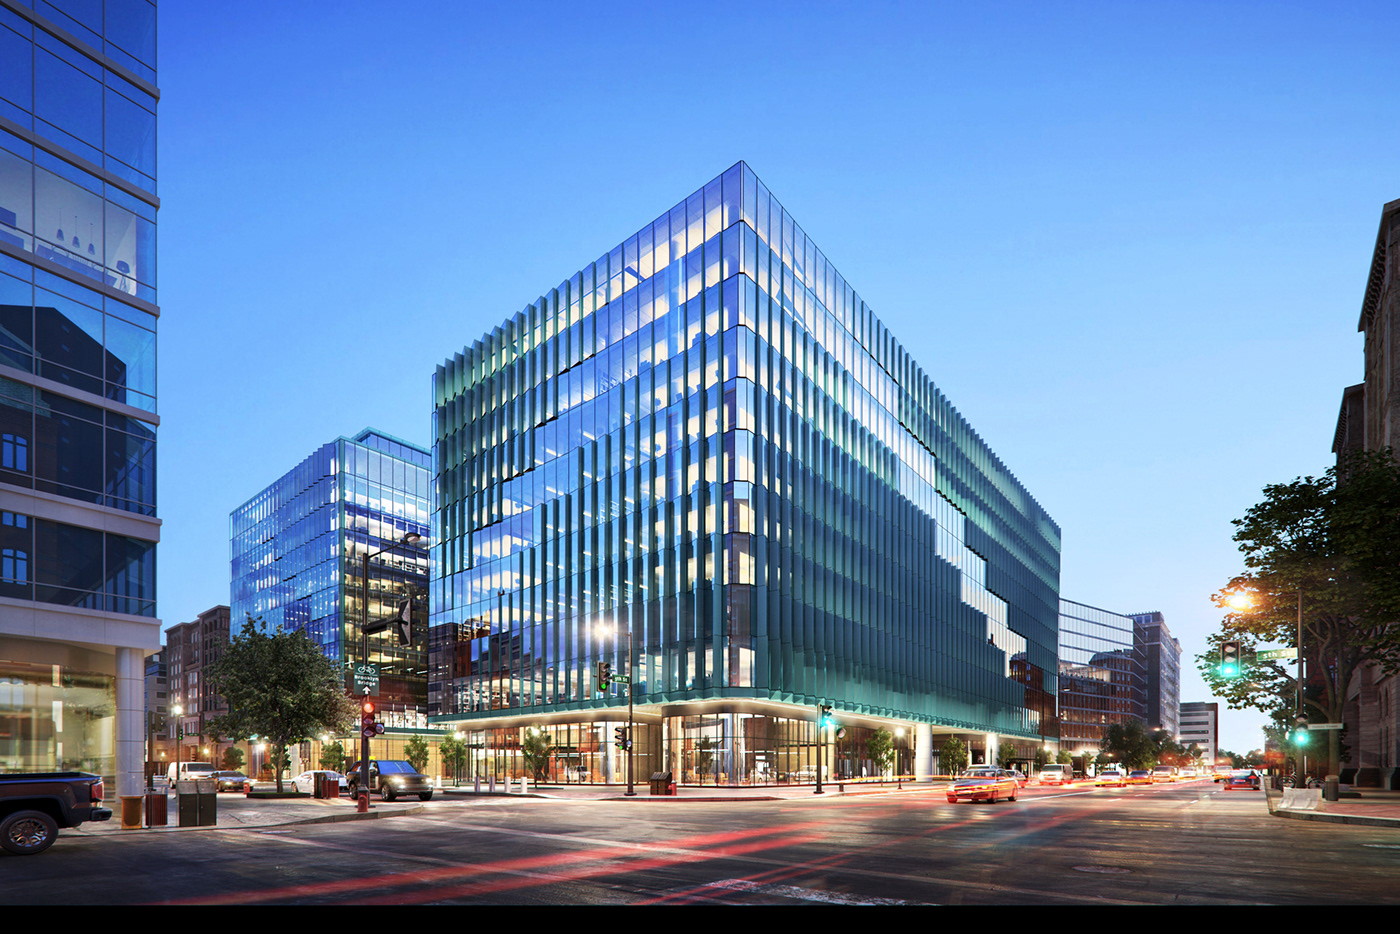 Night Effect Office street view 3D Rendering visual